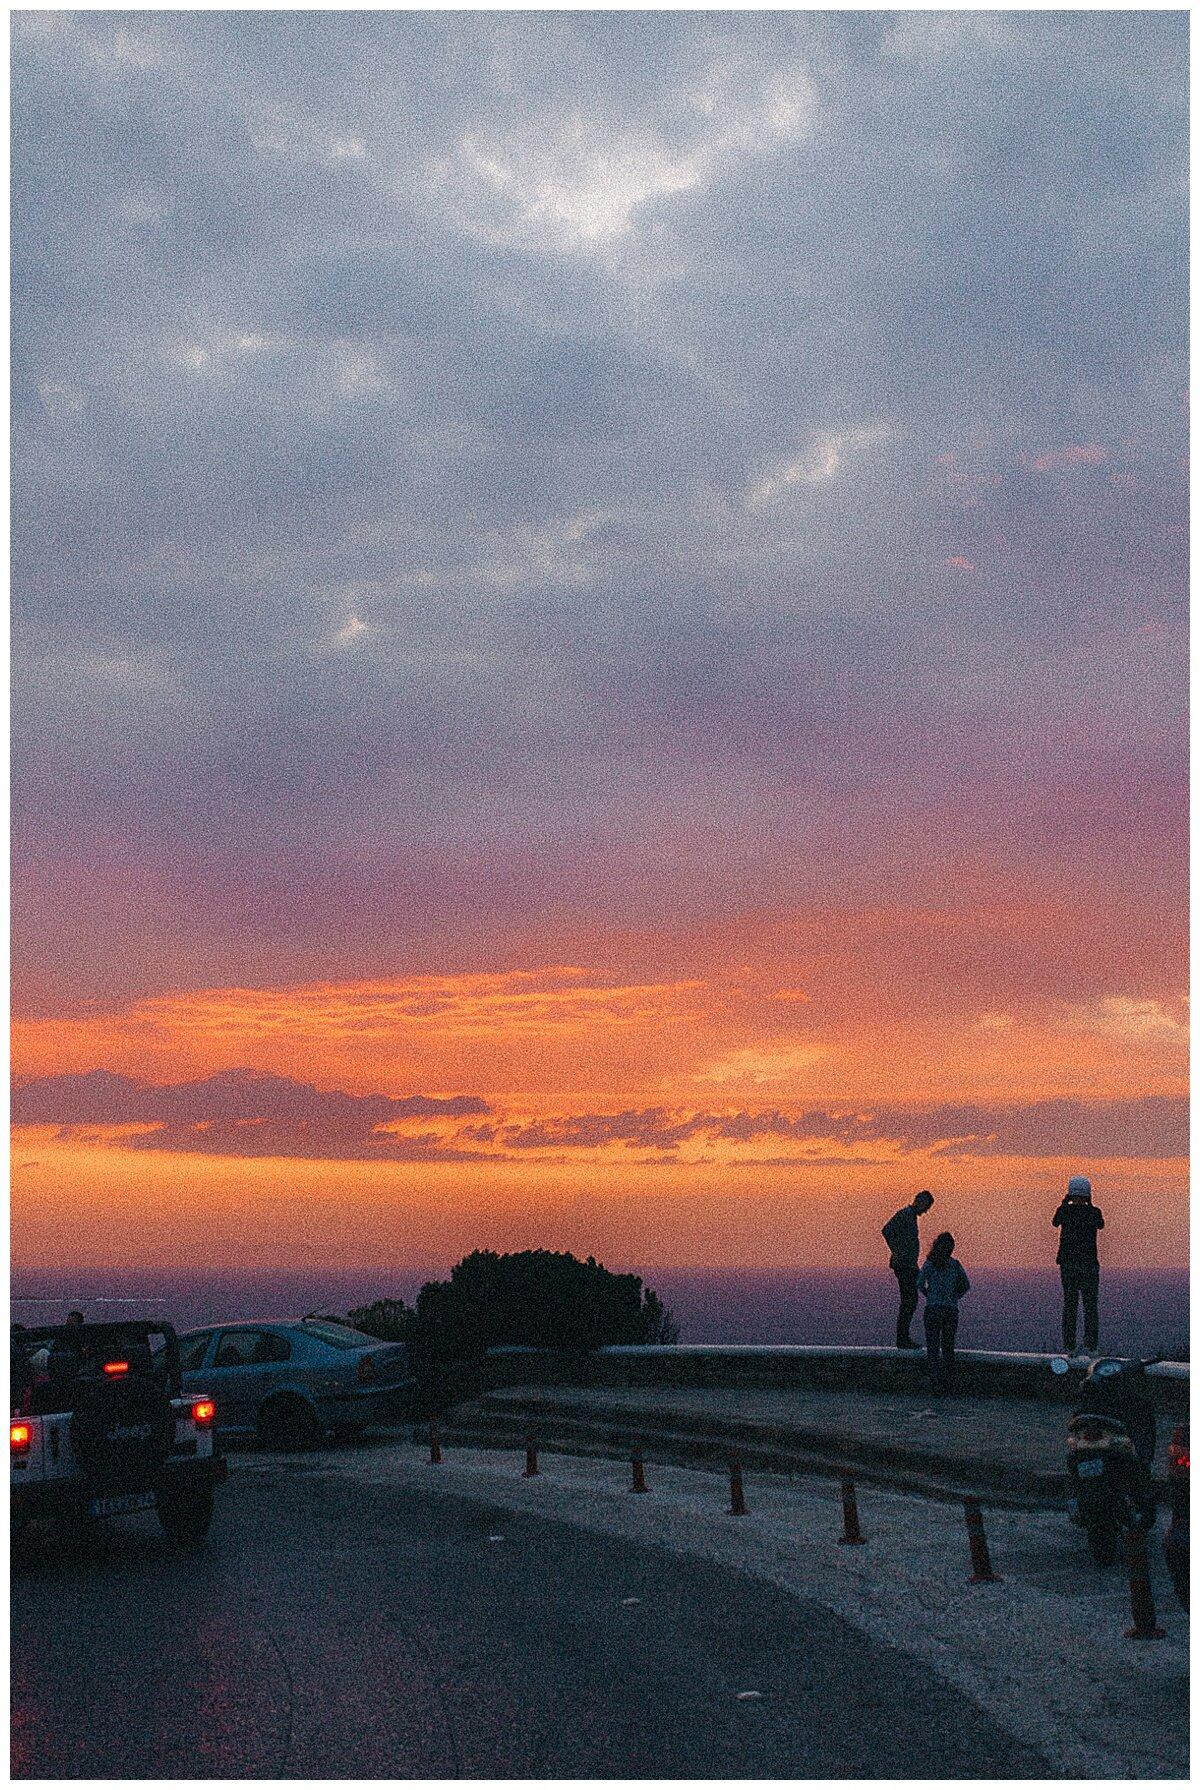 VENICE-COUPLE-PHOTOSHOOT-film-fuji-400h-stefano-degirmenci_0892.jpg